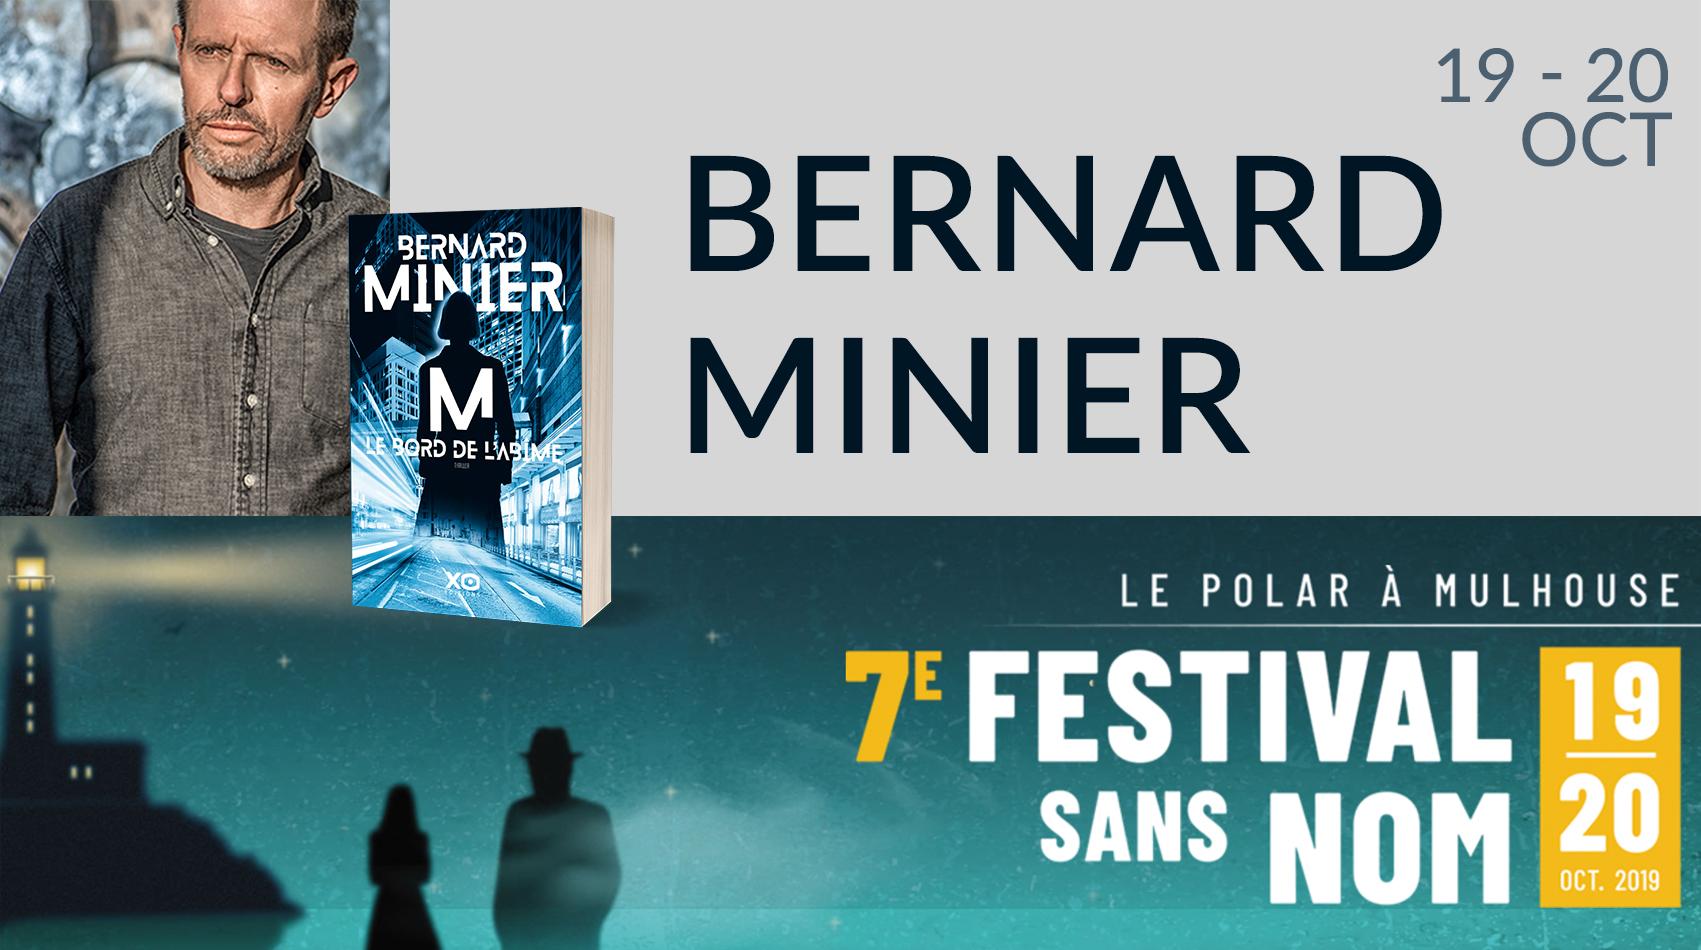 BERNARD MINIER AU FESTIVAL SANS NOM DE MULHOUSE